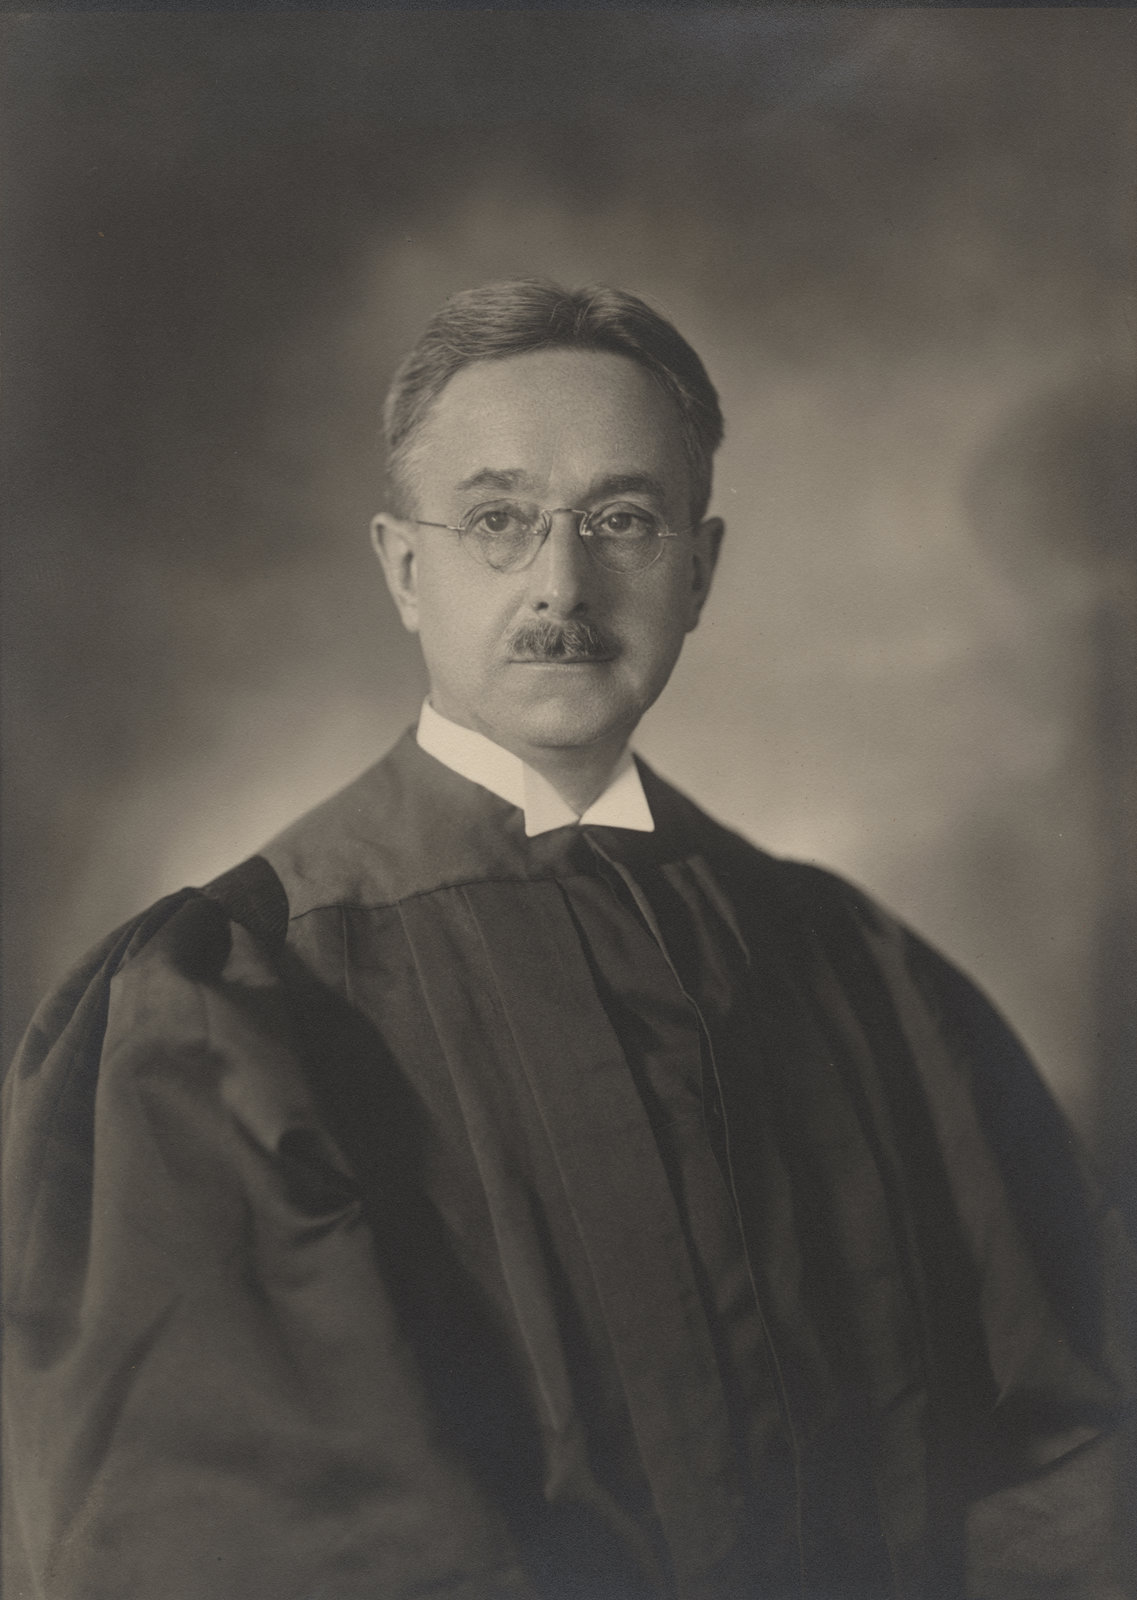 Frederick B. Clausen